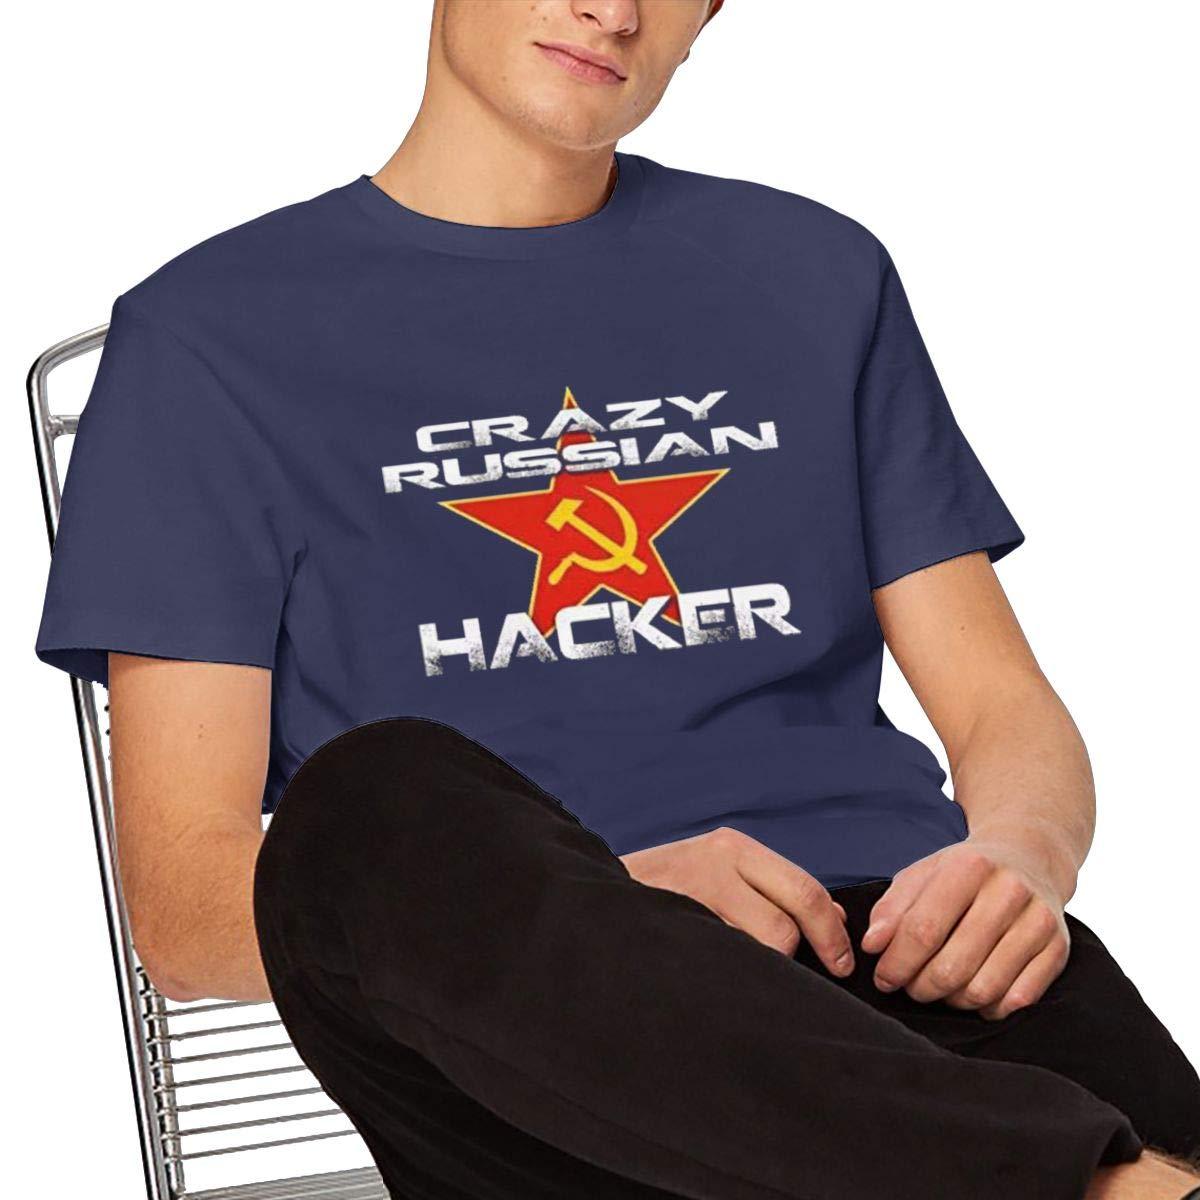 Tiwywln Crazy Russian Hacker Mens Tee Fashion T-Shirt Navy